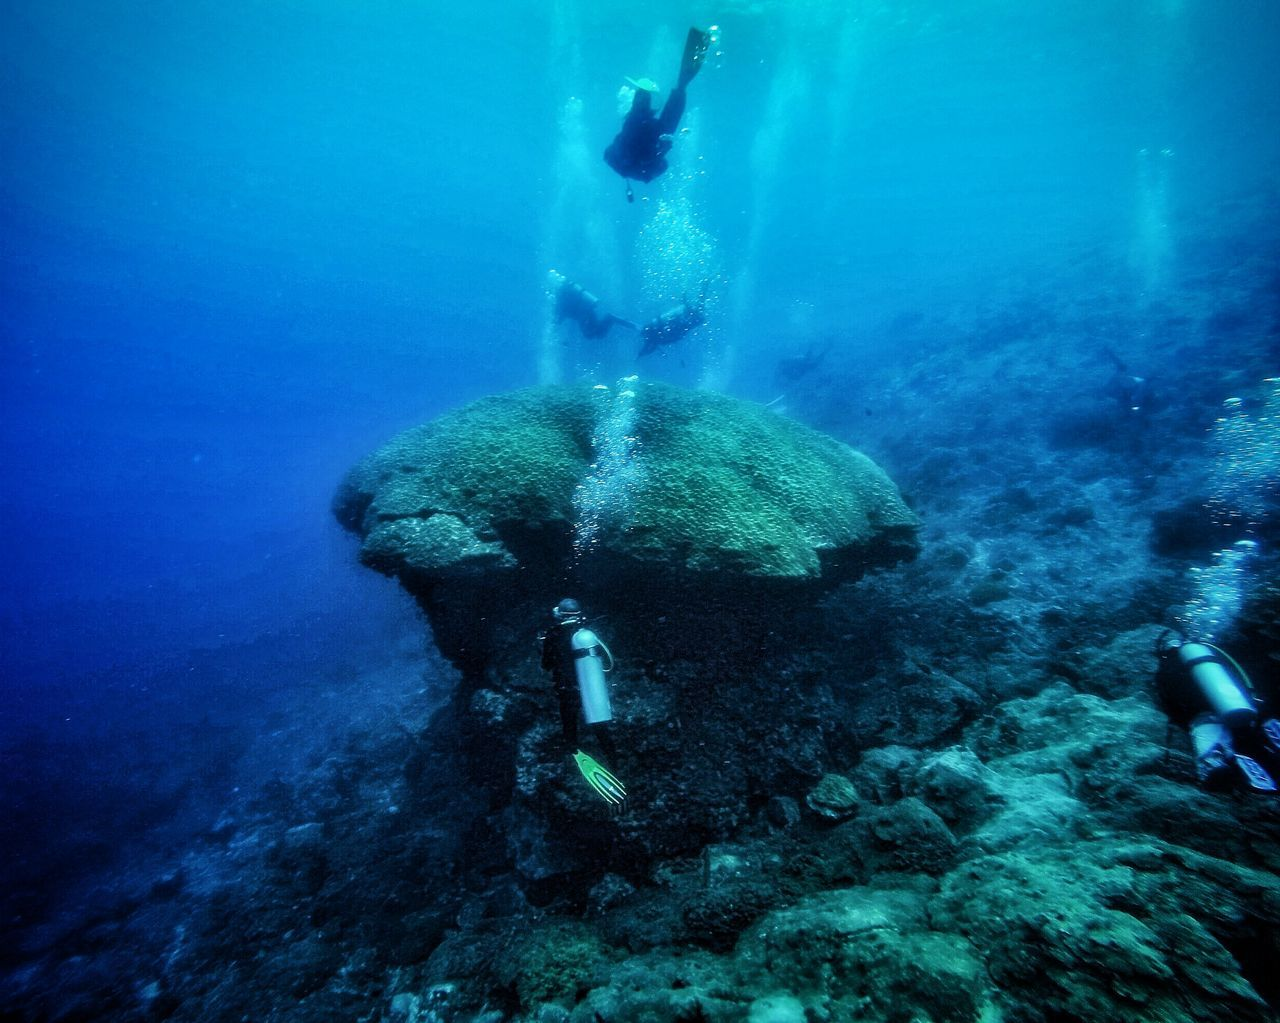 Underwater Water UnderSea Wildlife Blue Sea Life Sea Underwater Diving Gopro Malaysia Visitmalaysia Terengganu Island Divingphotography Diving Scubadiving Marine Life Nature Coral Reef UnderSea Fish Terengganu